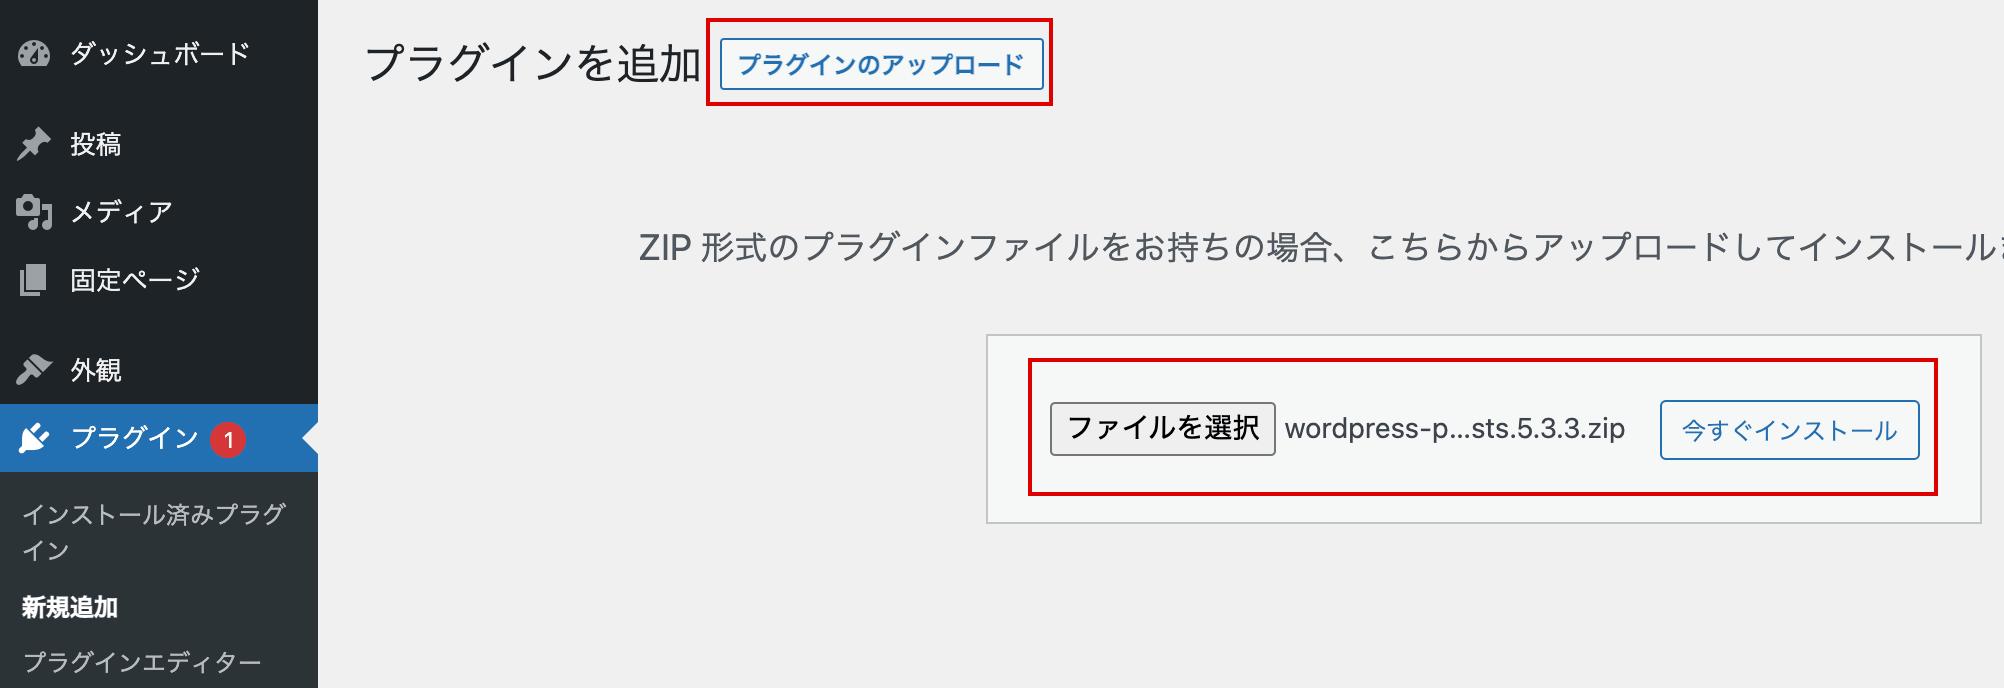 WordPress管理画面 プラグイン 新規追加